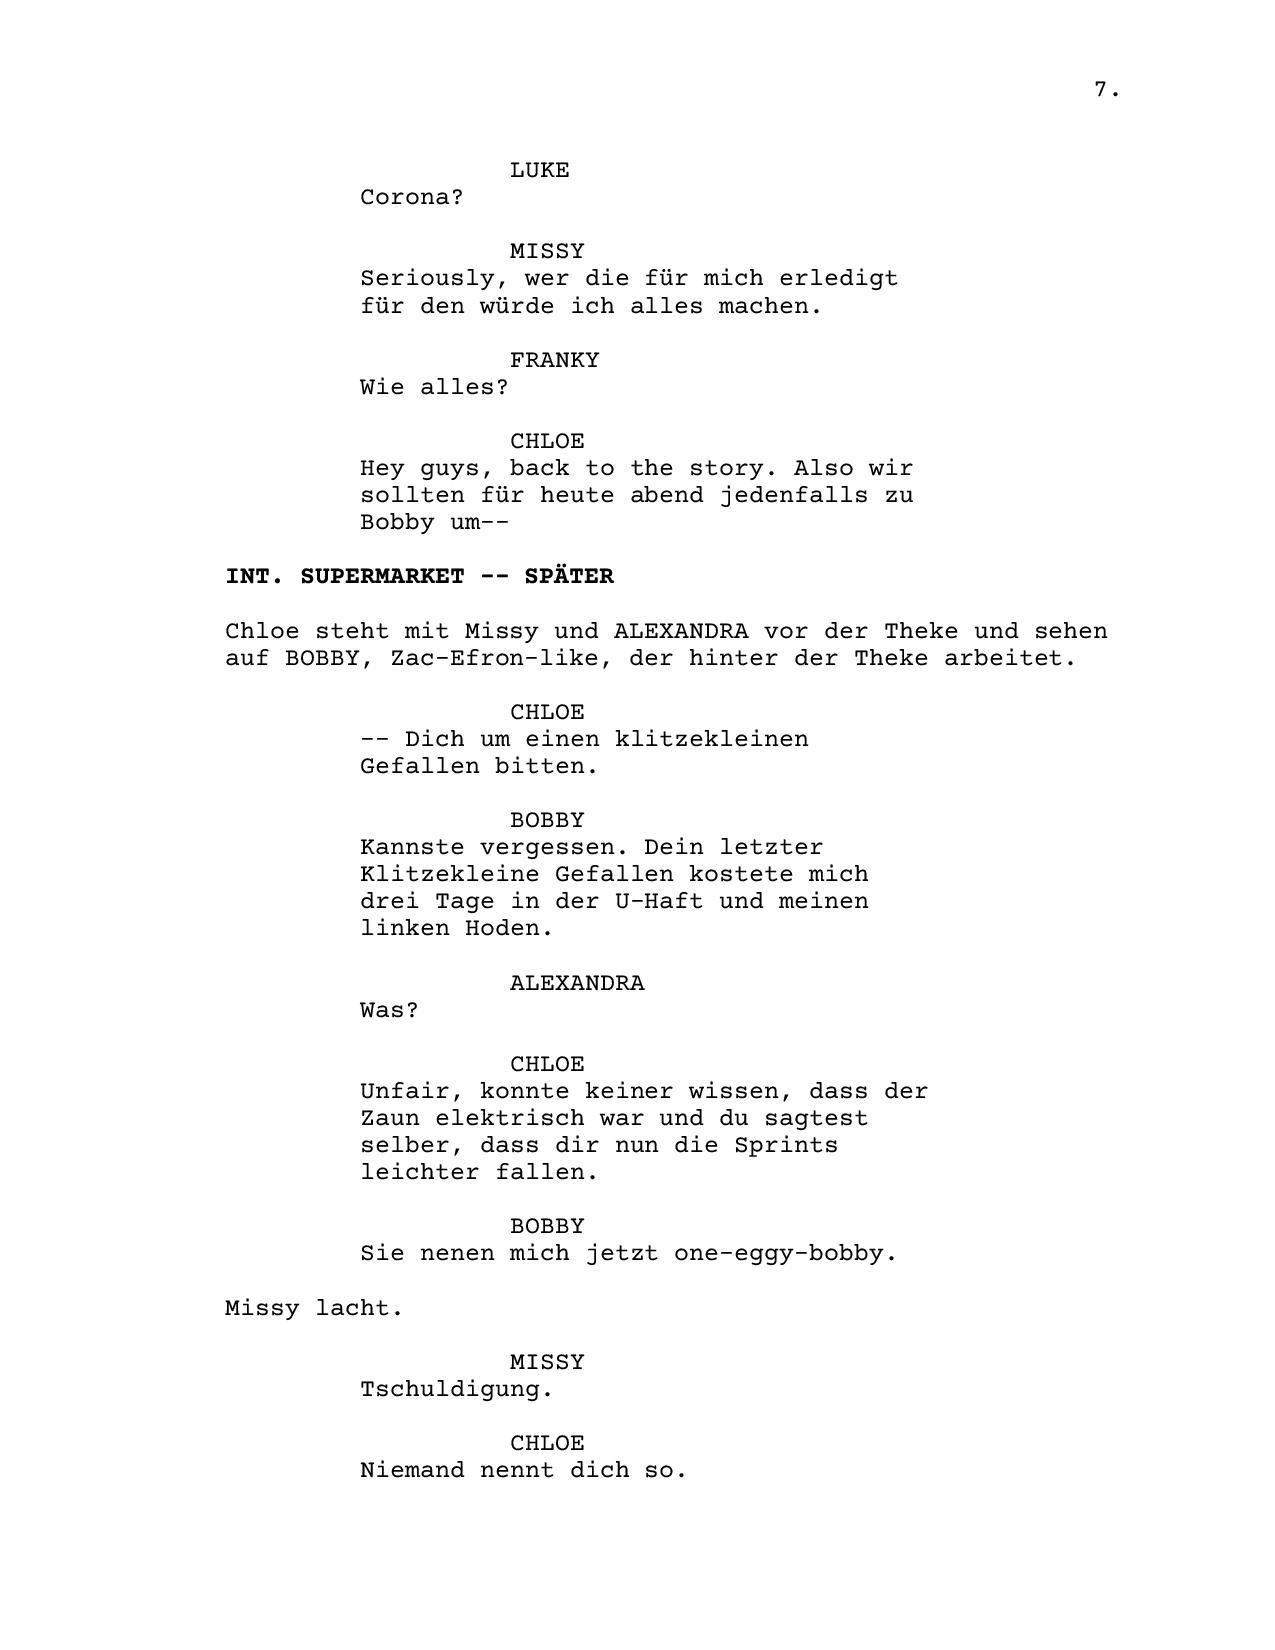 Professional Screenwriting